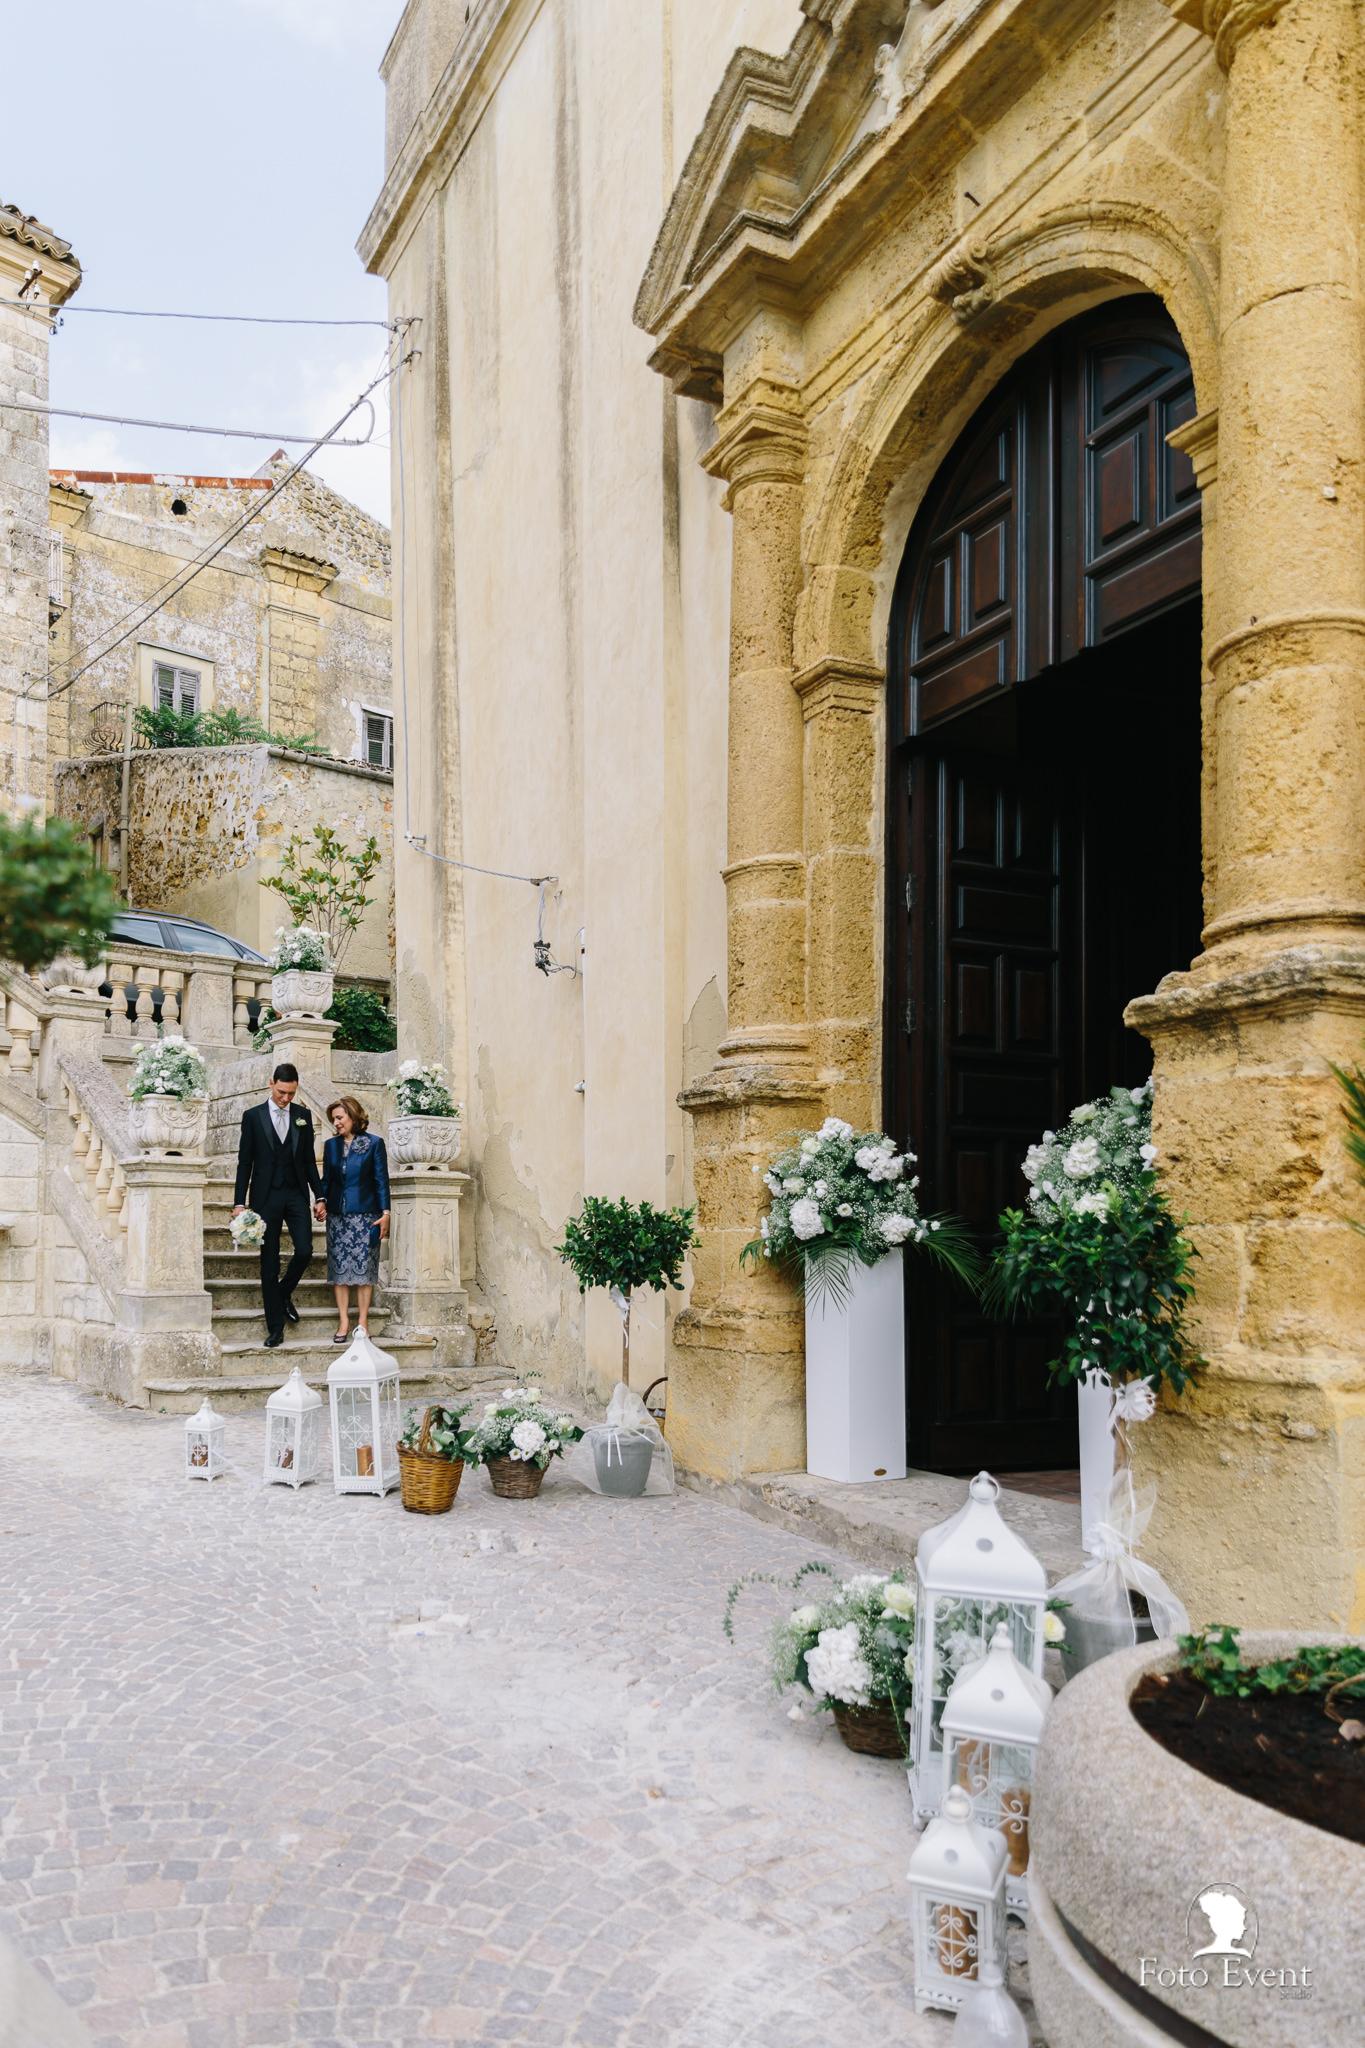 020-2019-08-23-Matrimonio-Lucia-e-Rosario-Scopelliti-5DE-1197